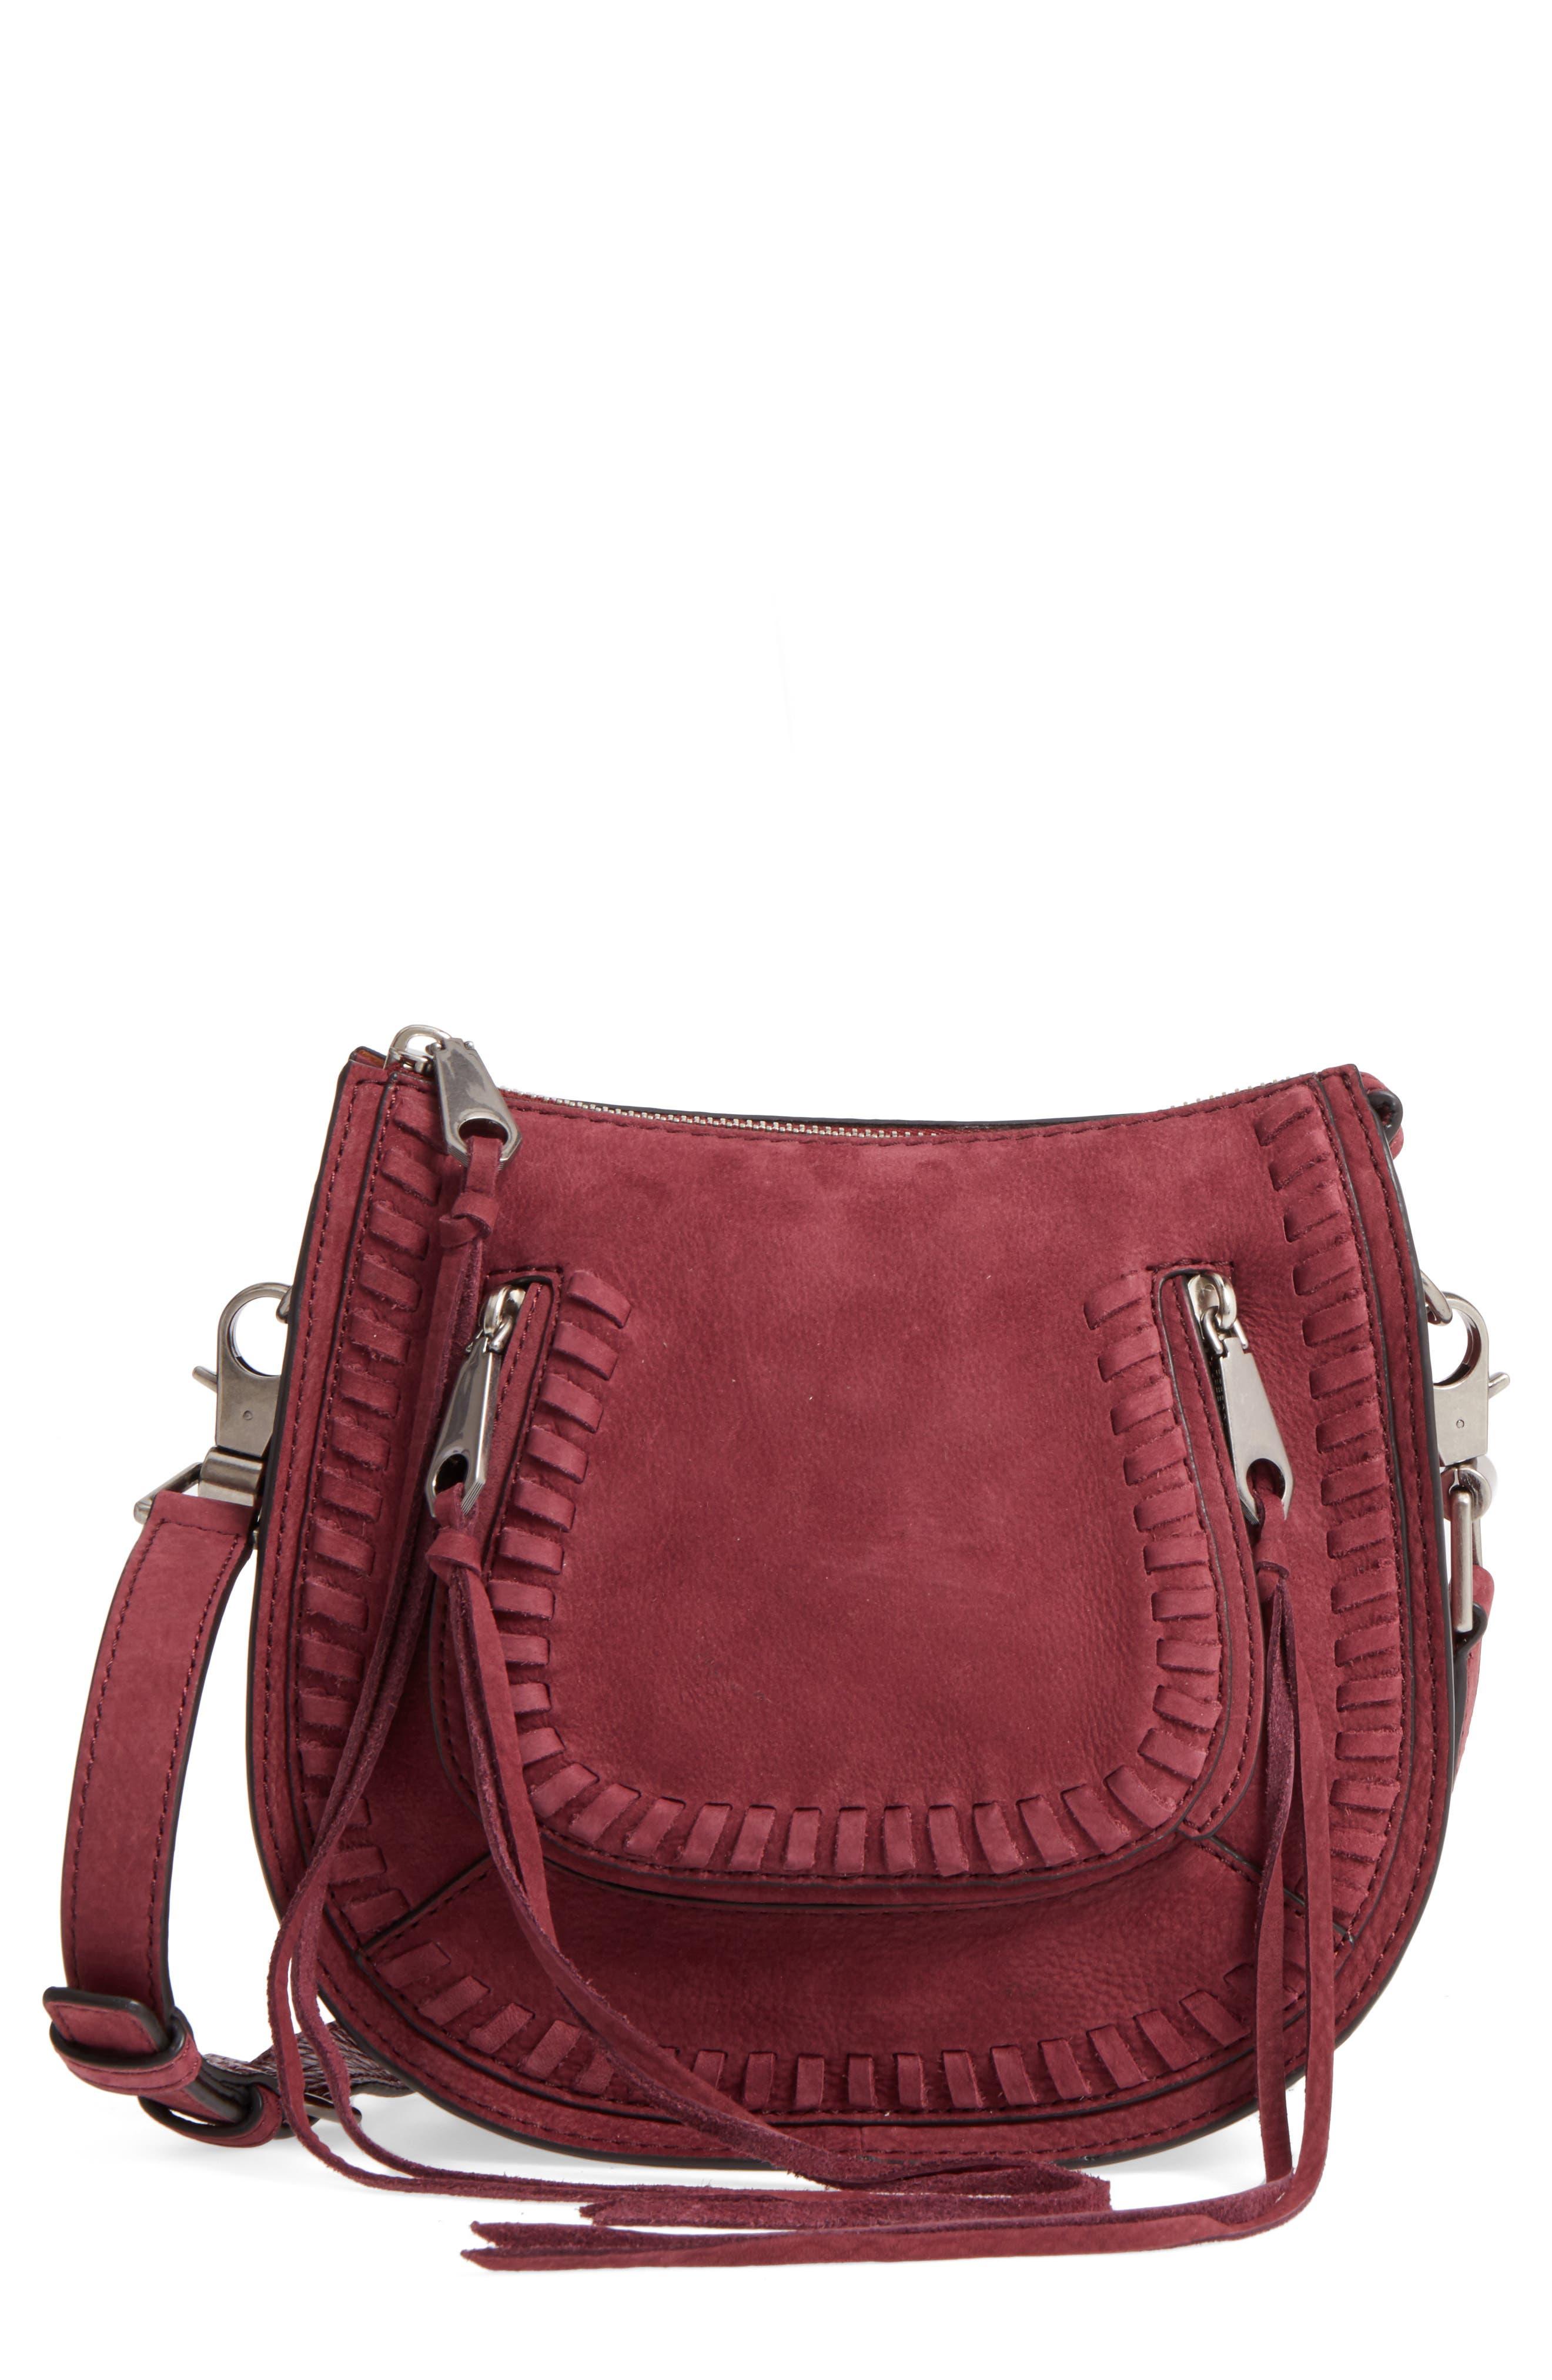 Rebecca Minkoff Mini Vanity Saddle Bag